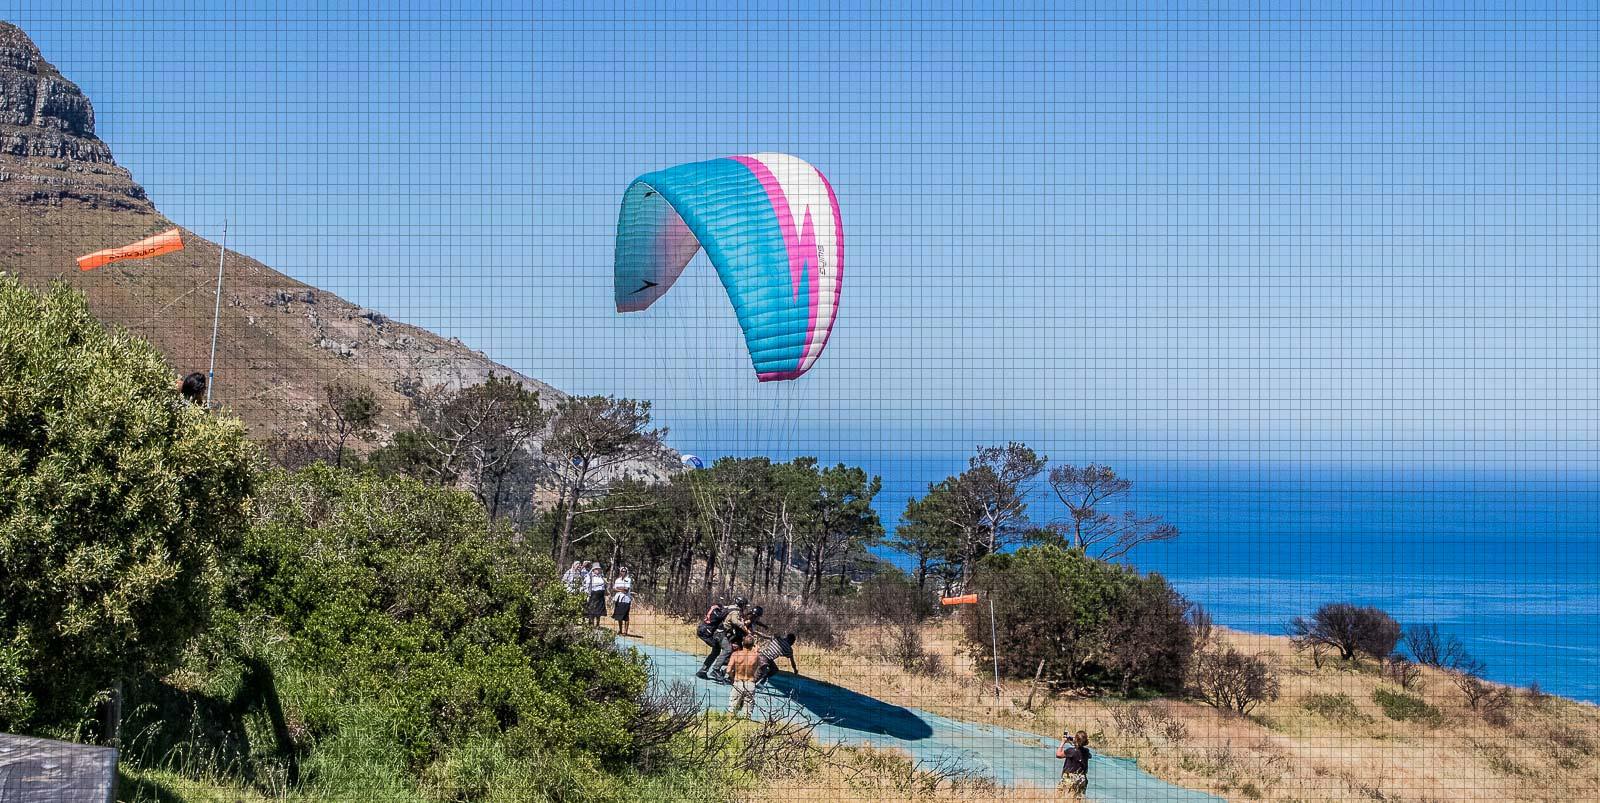 Africa_Safari_Paragliding_Cape_Town